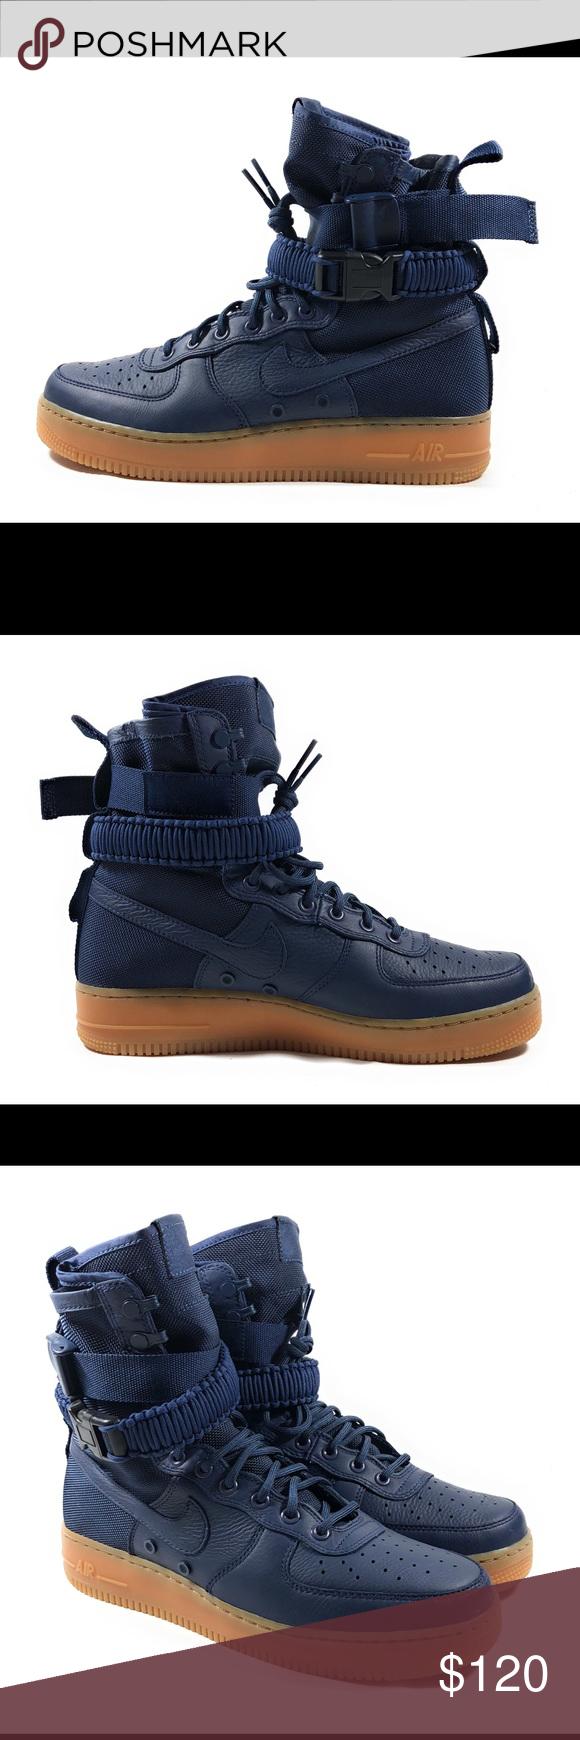 Nike SF Air Force 1 Midnight Navy Sneaker Boots Nike SF Air